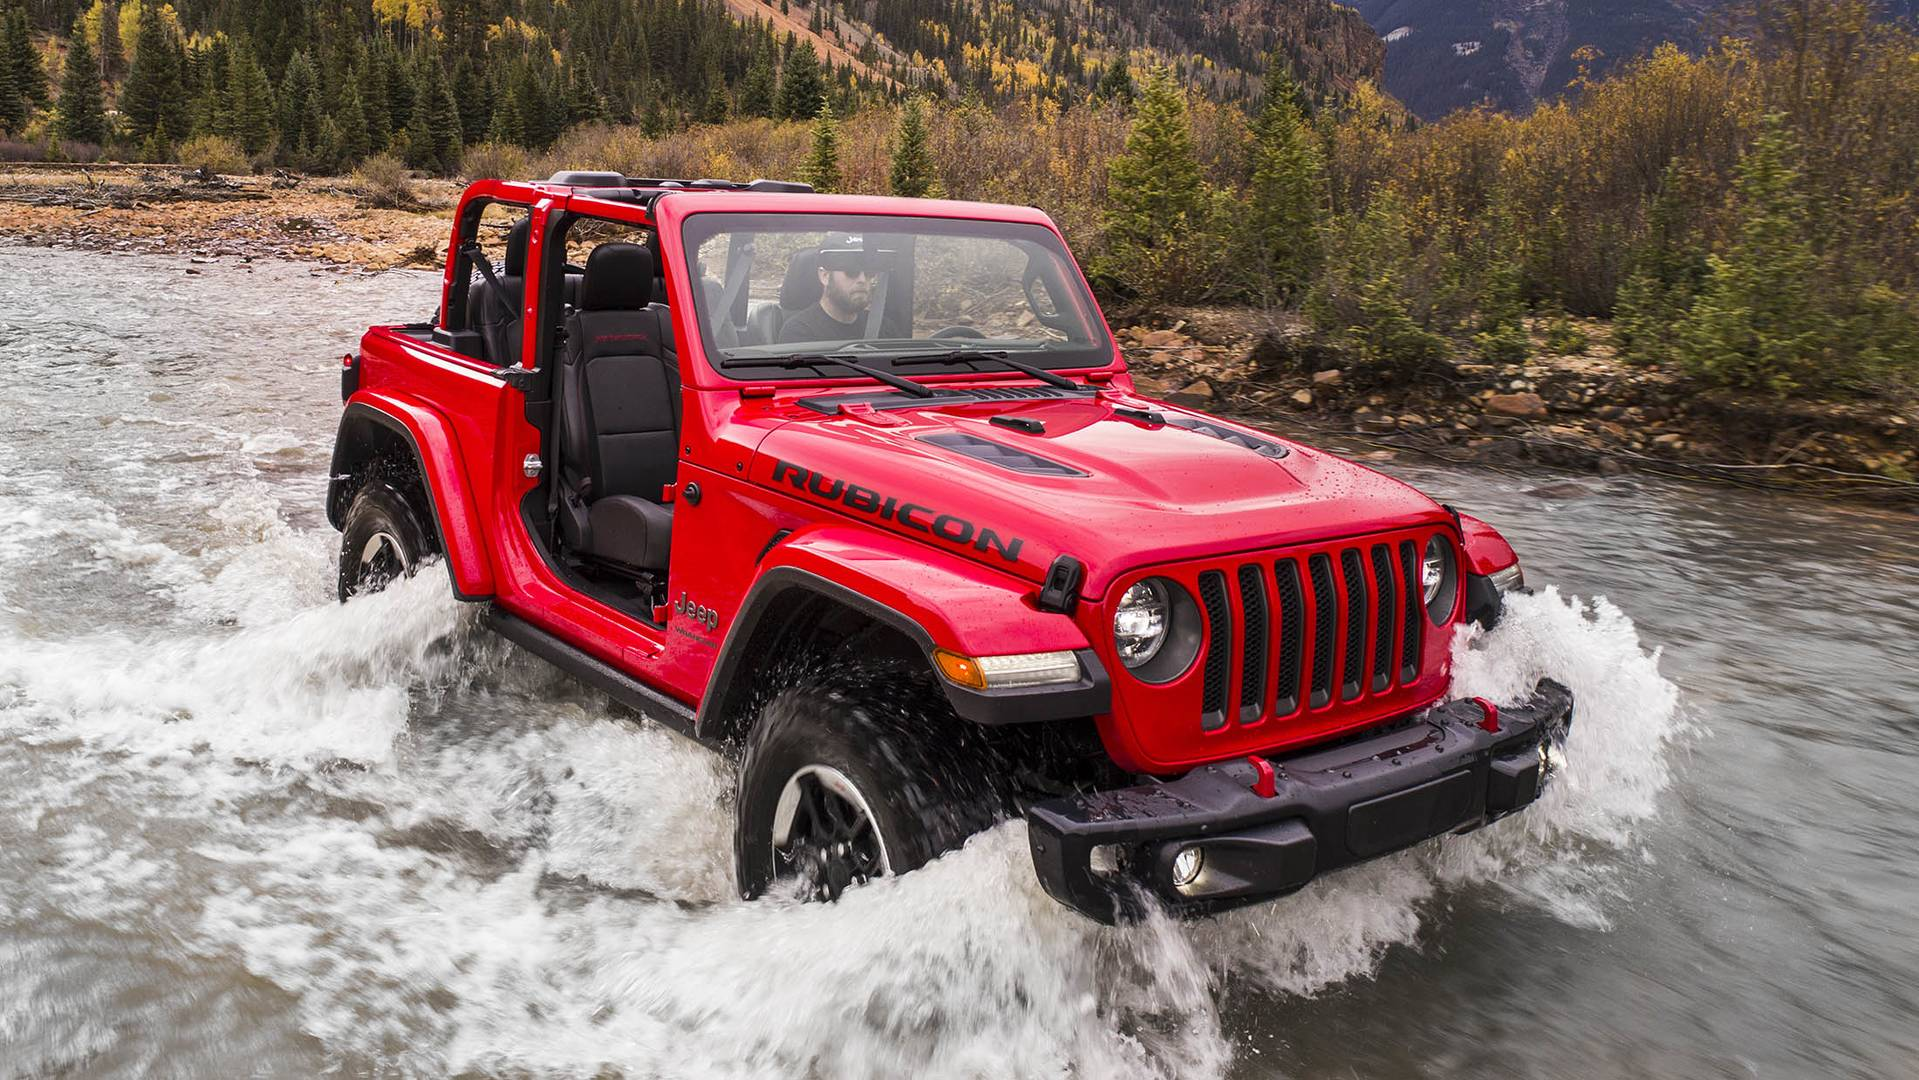 2019 Jeep Wrangler Confirmed With EcoDiesel V6, eTorque ...